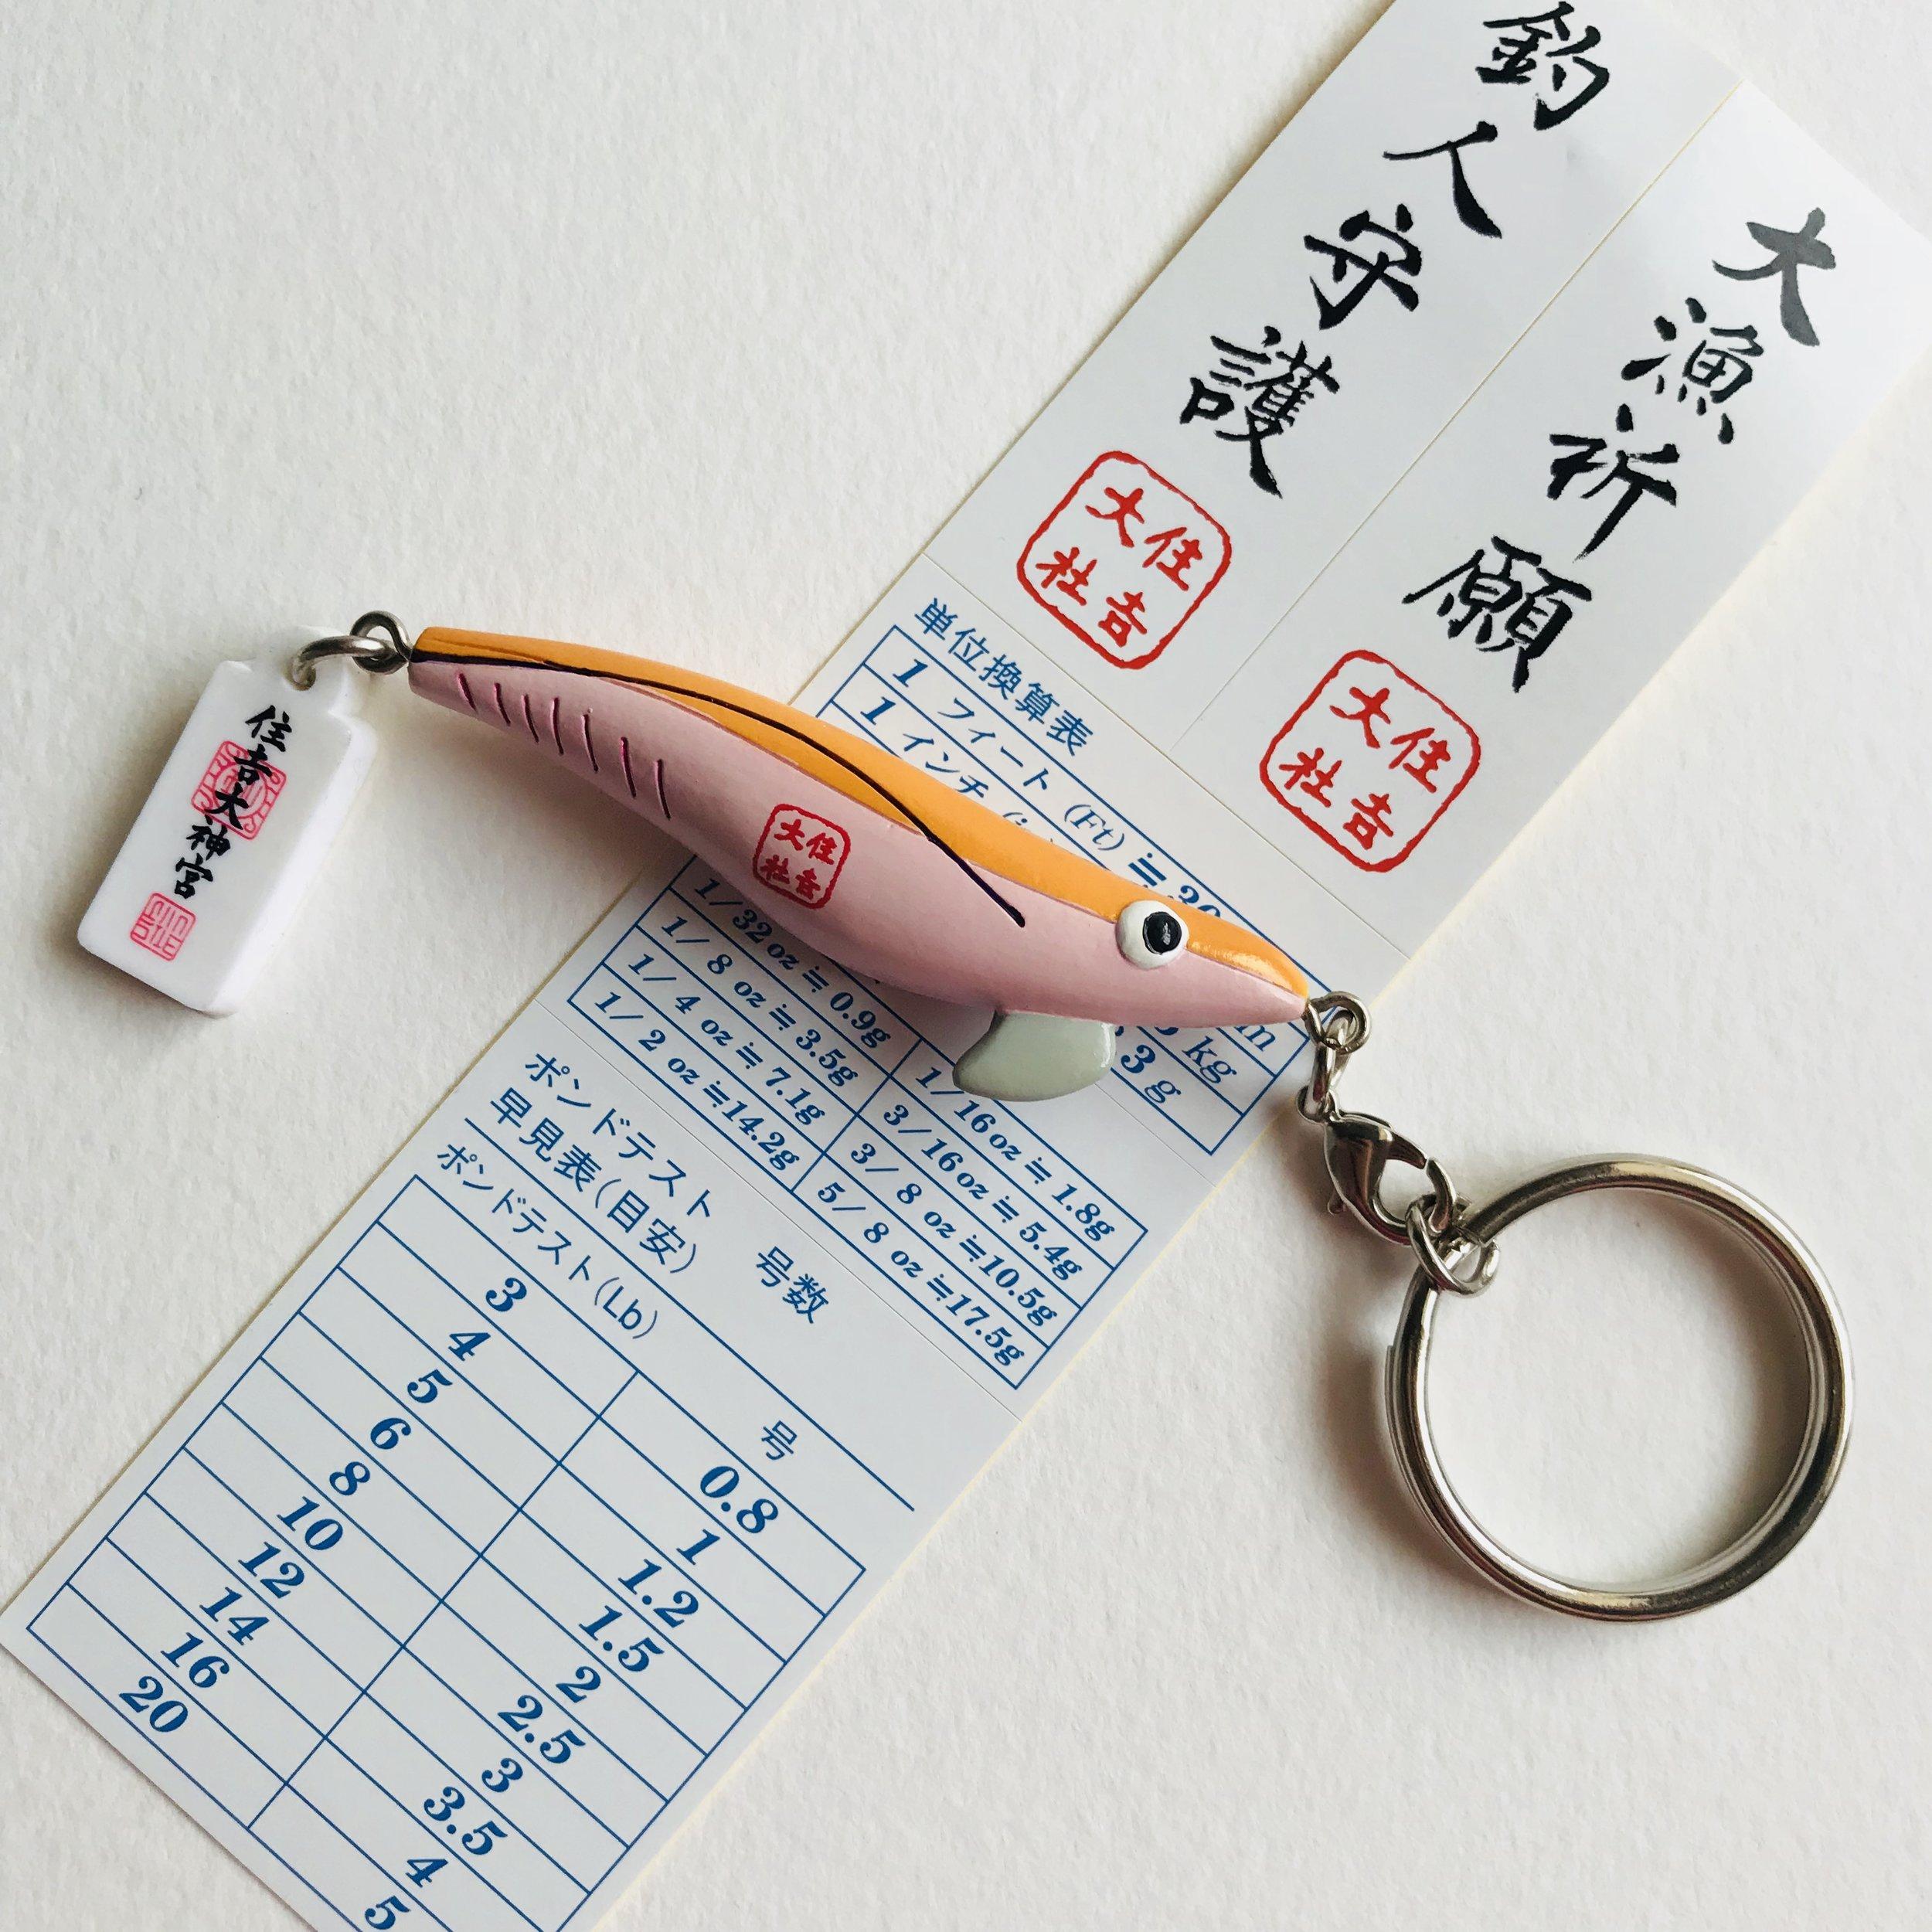 Sumiyoshi Taisha 住吉大社